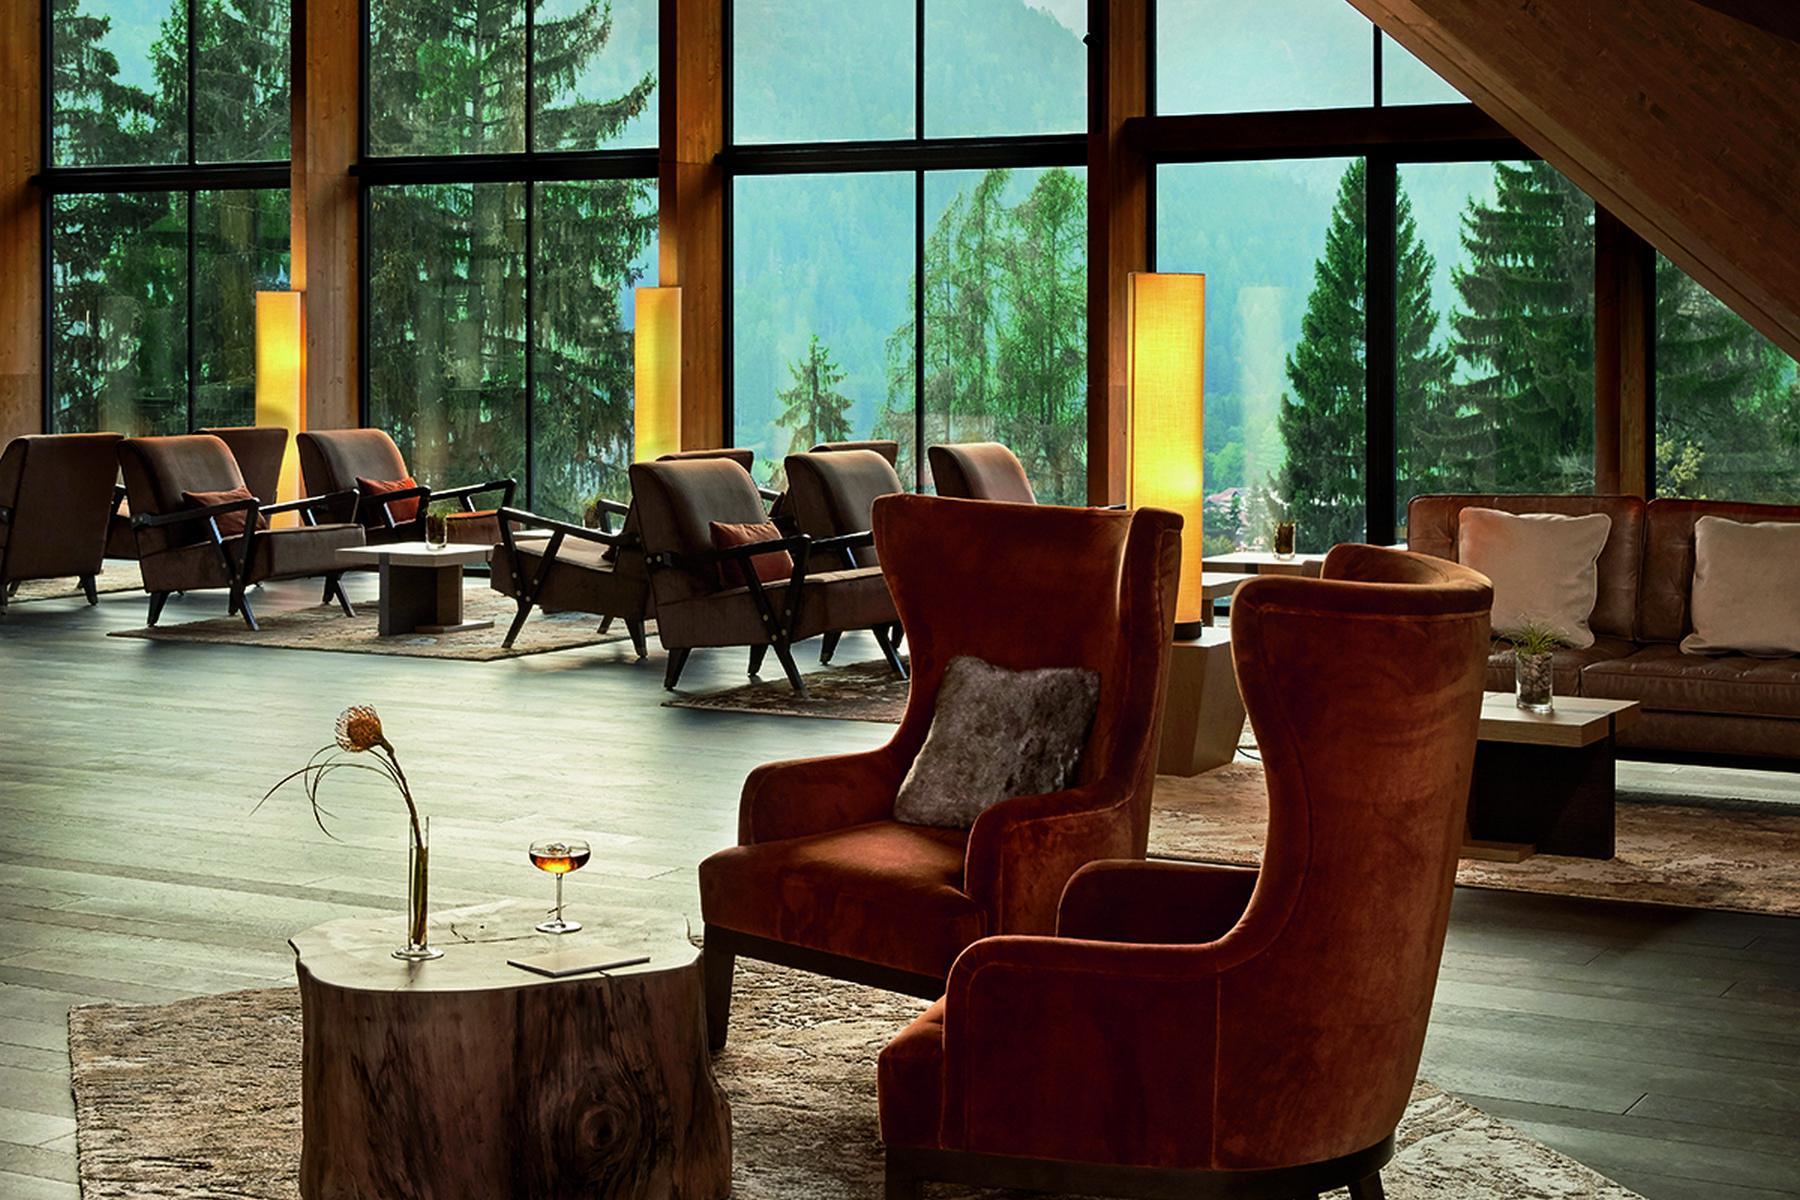 Splendide residenze di lusso sulle Dolomiti - 12